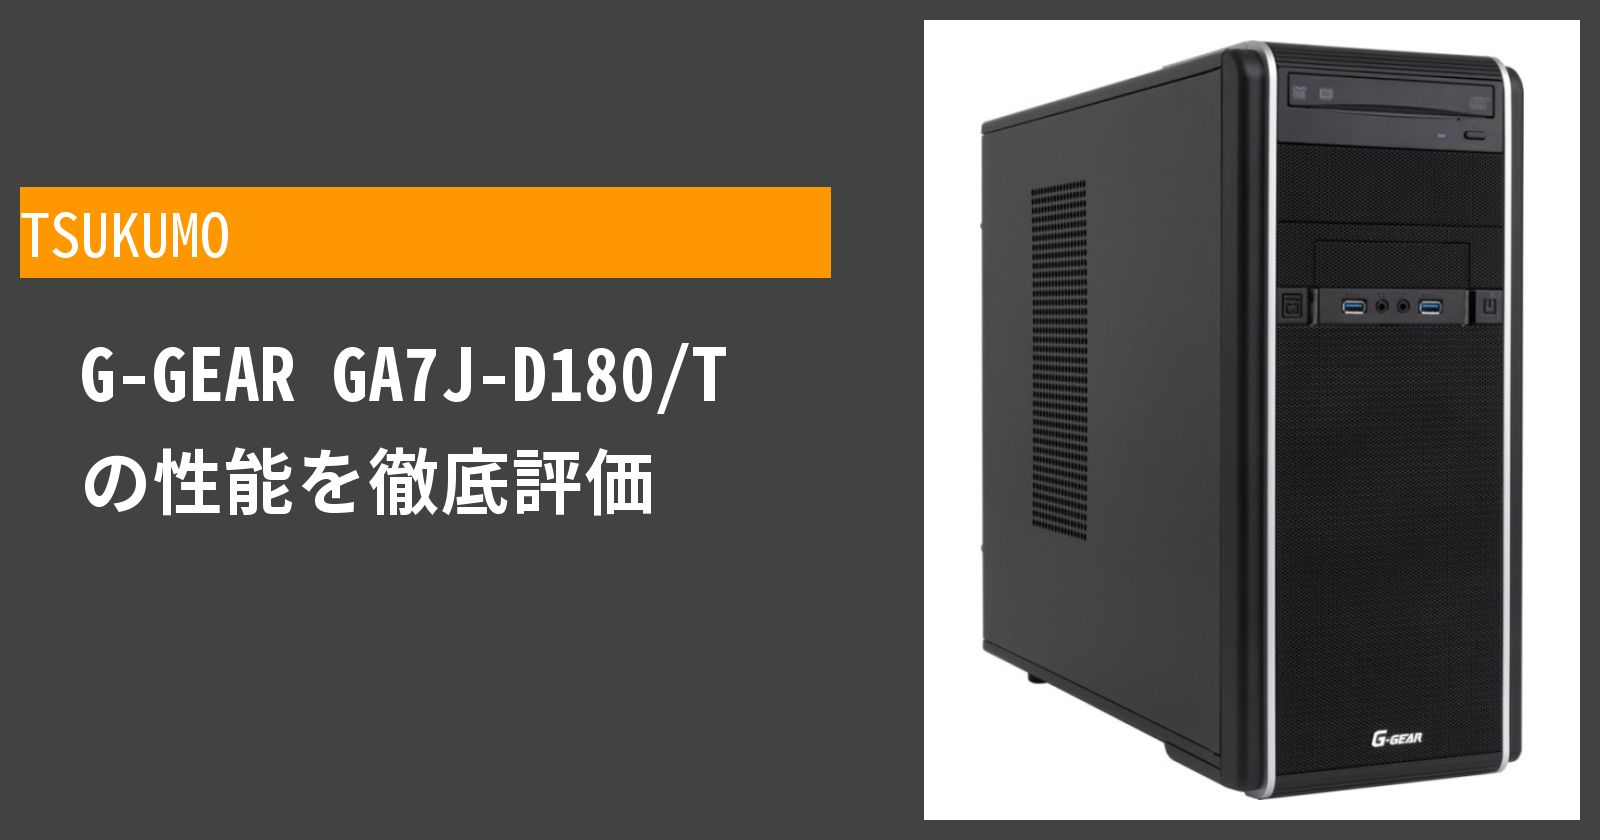 G-GEAR(GA7J-D180/T) の性能を徹底評価